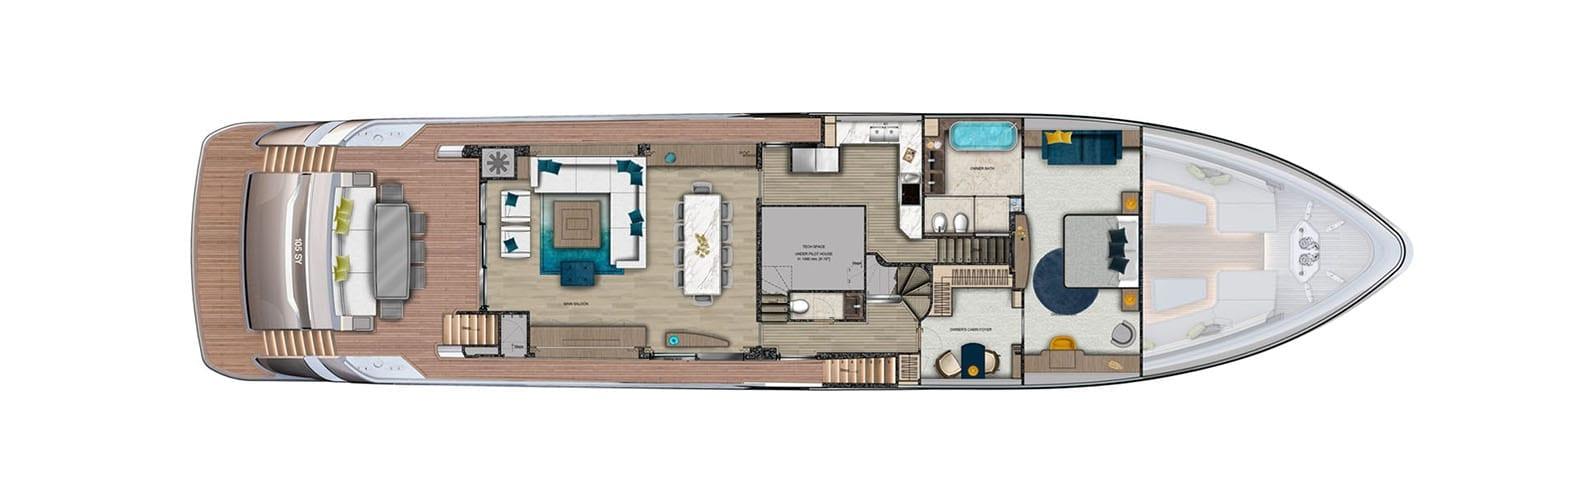 SY_105_floorplan4